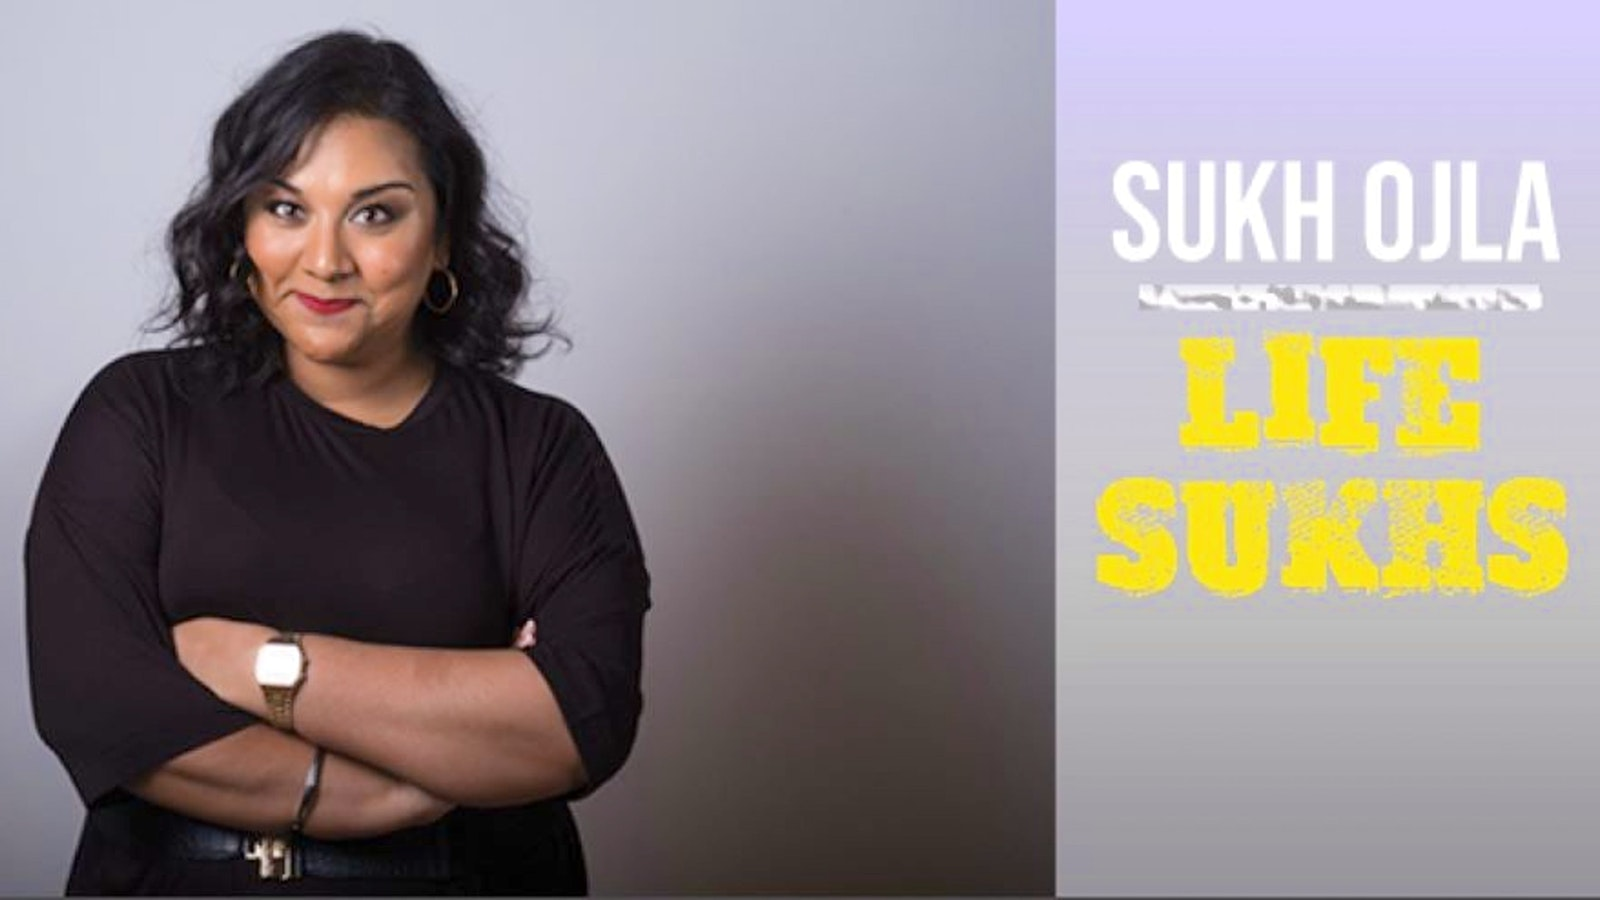 Sukh Ojla : Life Sukhs – Manchester